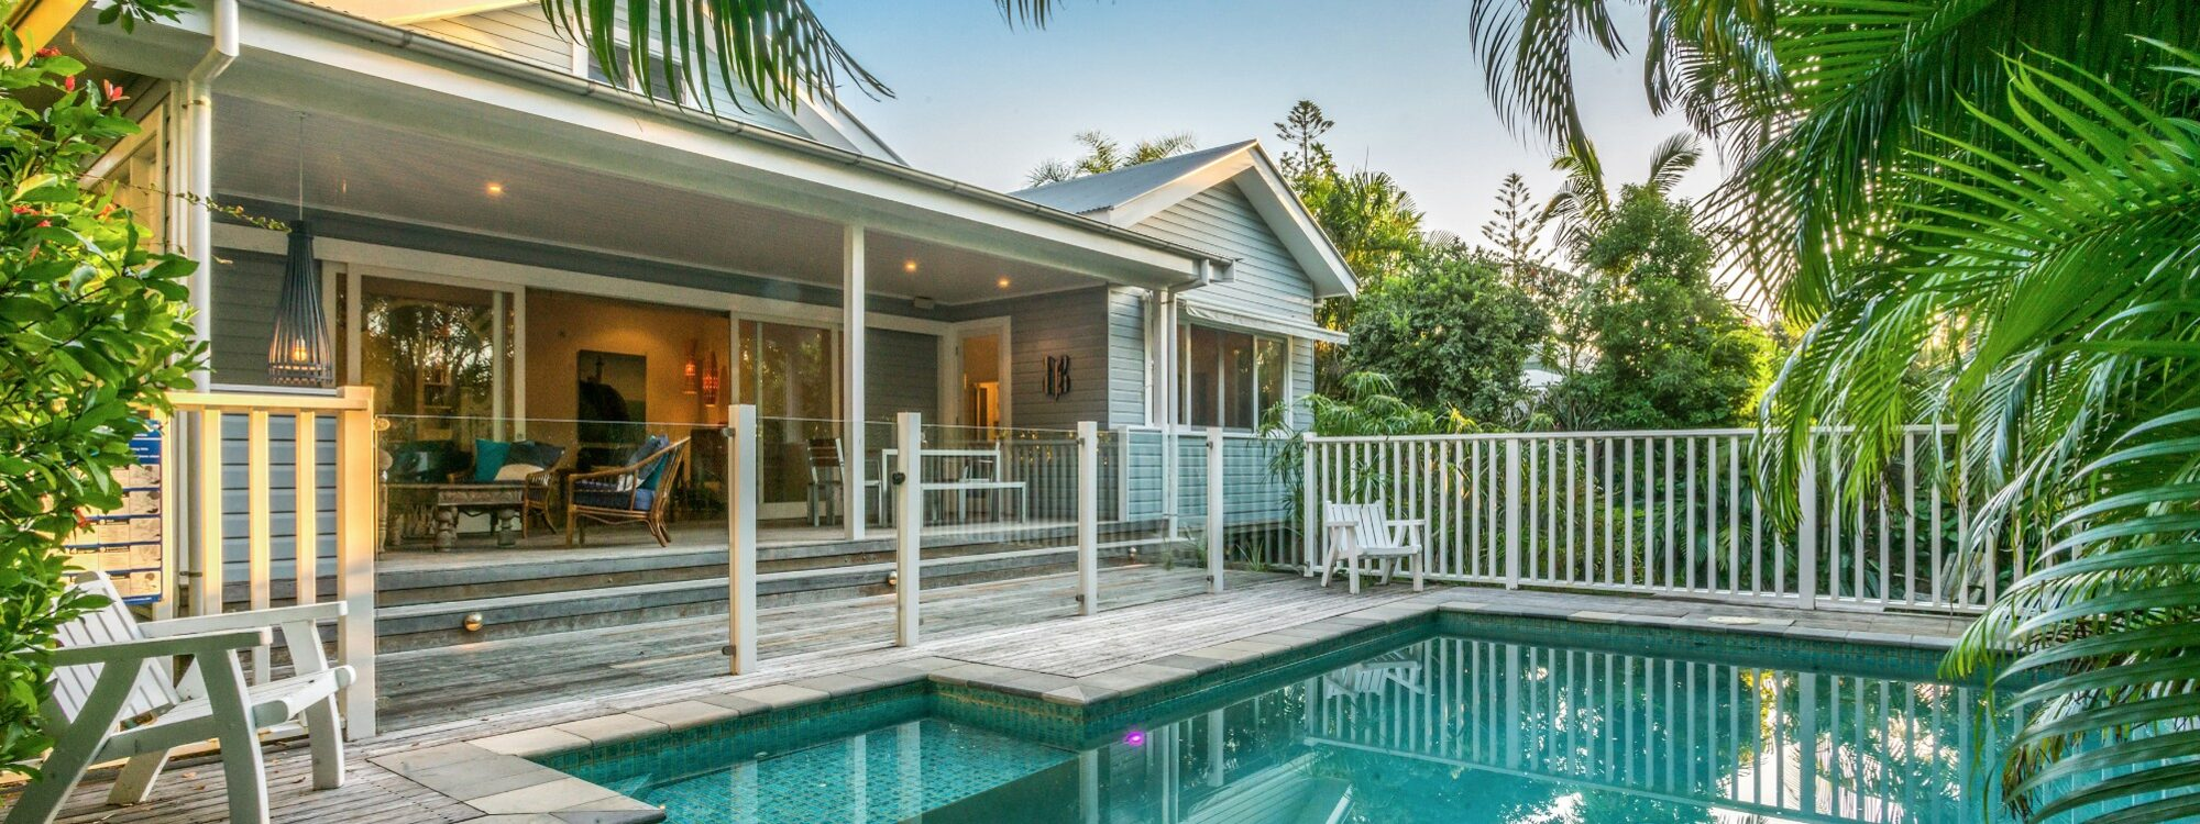 Kia Ora - Byron Bay - Pool and House